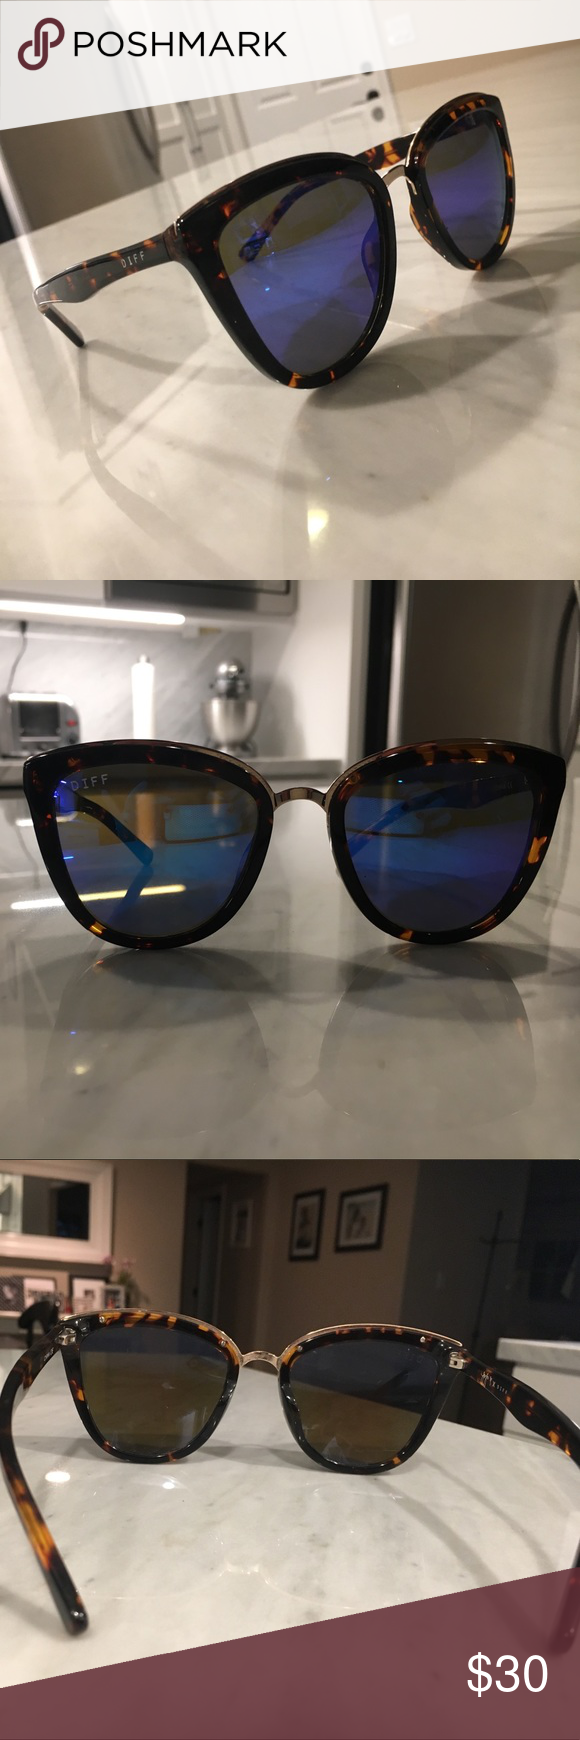 14b0fee2754a8 Diffeyewear sunglasses Jojo fletcher limited edition diffeyewear sunglasses.  Worn a few times. Minor scratches. Comes with case. Diff Eyewear Accessories  ...